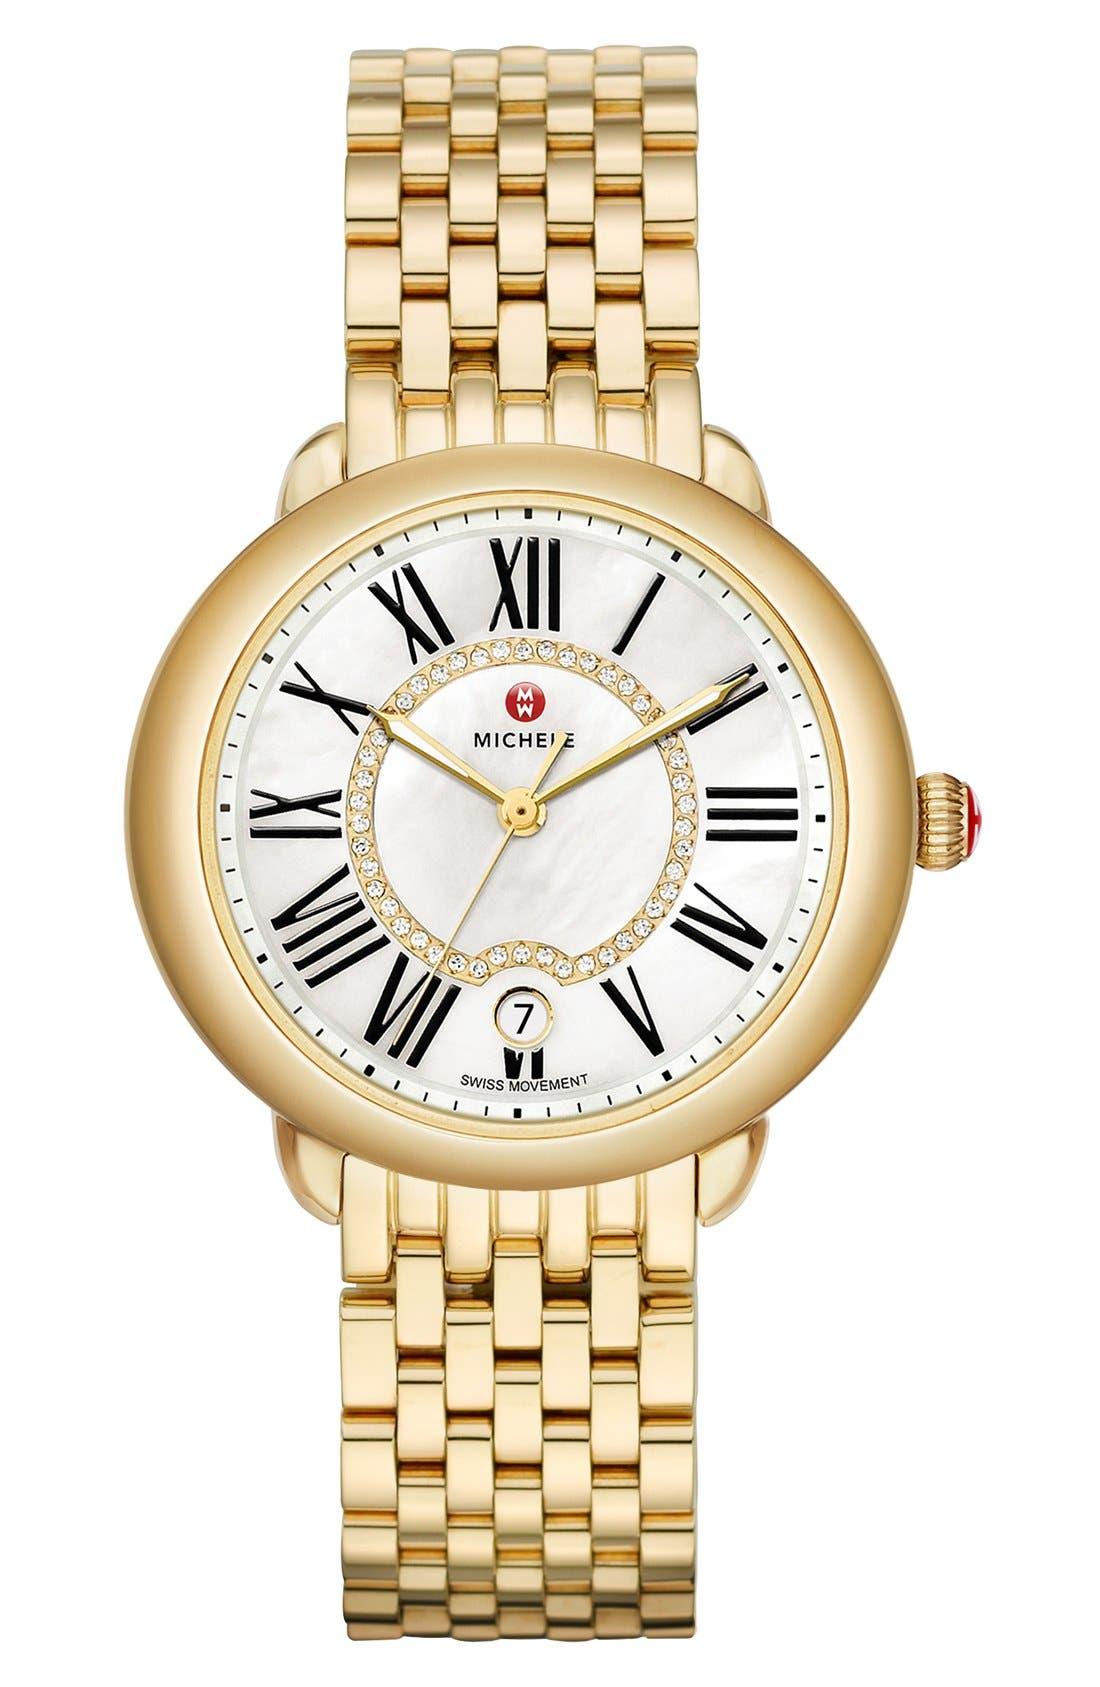 Serein 16 Diamond Dial Watch Head, 34mm x 36mm,                             Alternate thumbnail 3, color,                             GOLD